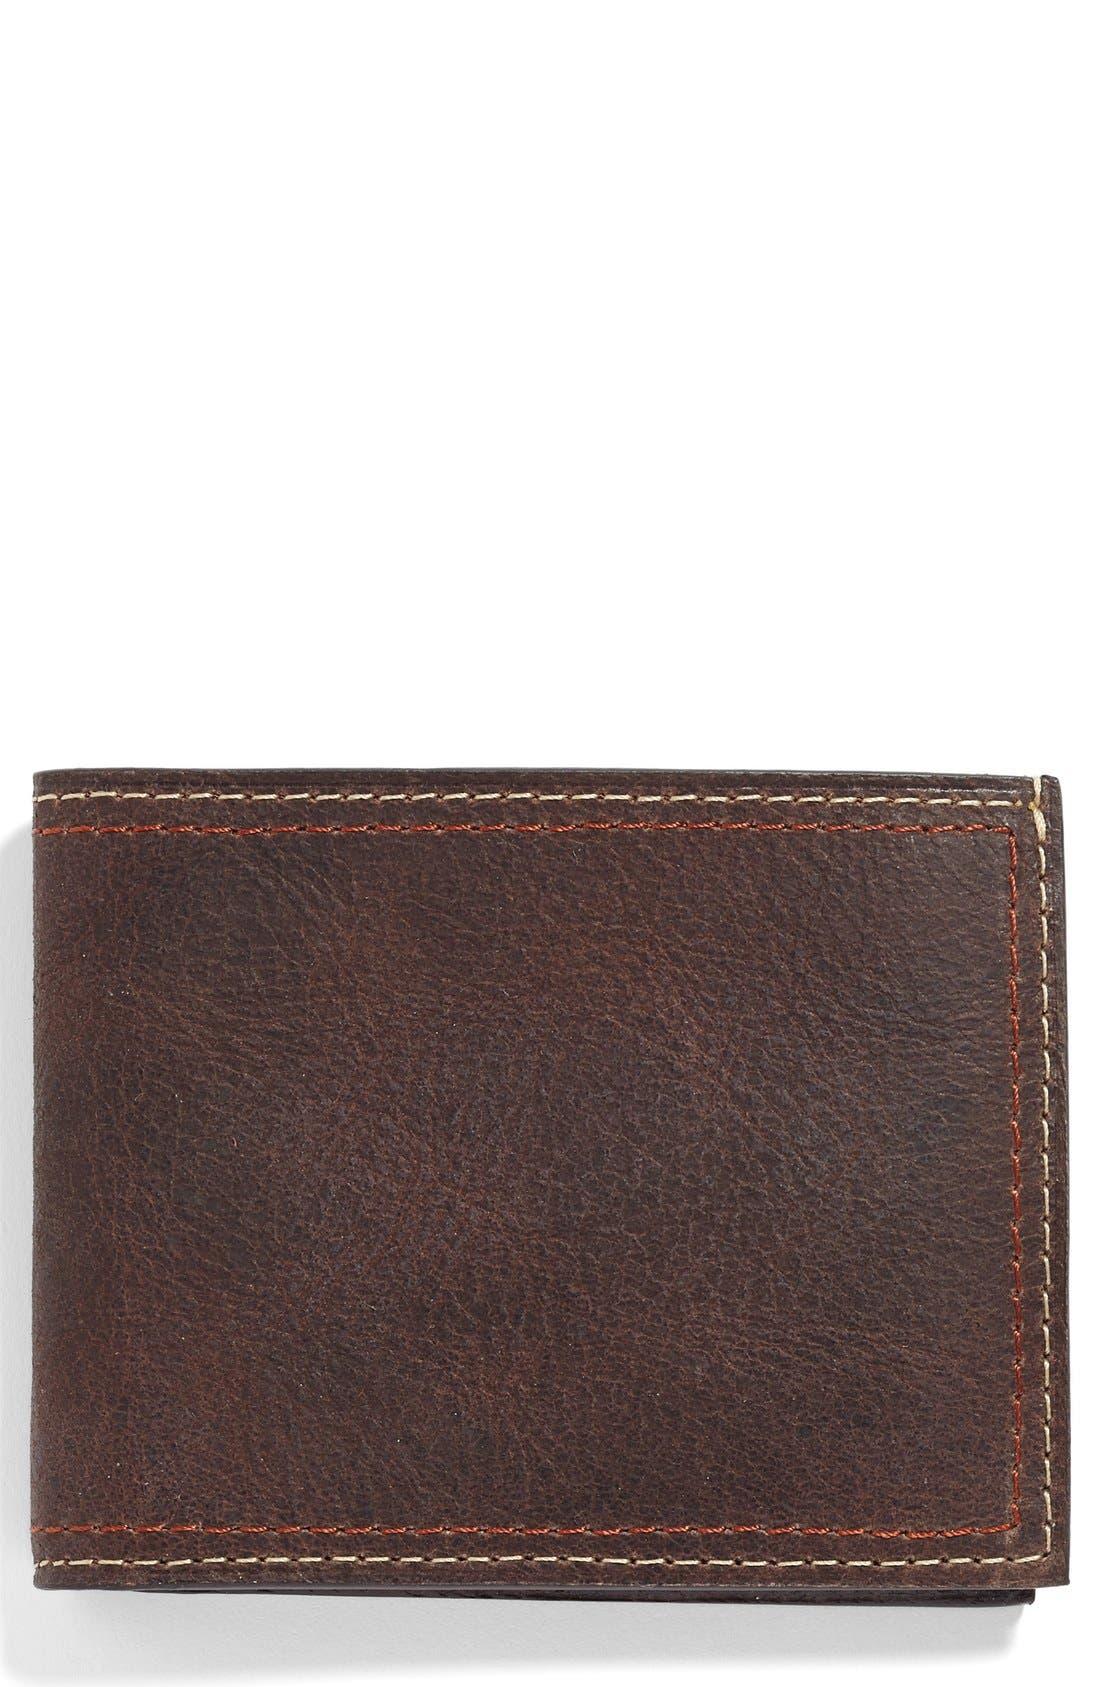 Water Buffalo Leather Wallet,                             Main thumbnail 1, color,                             203